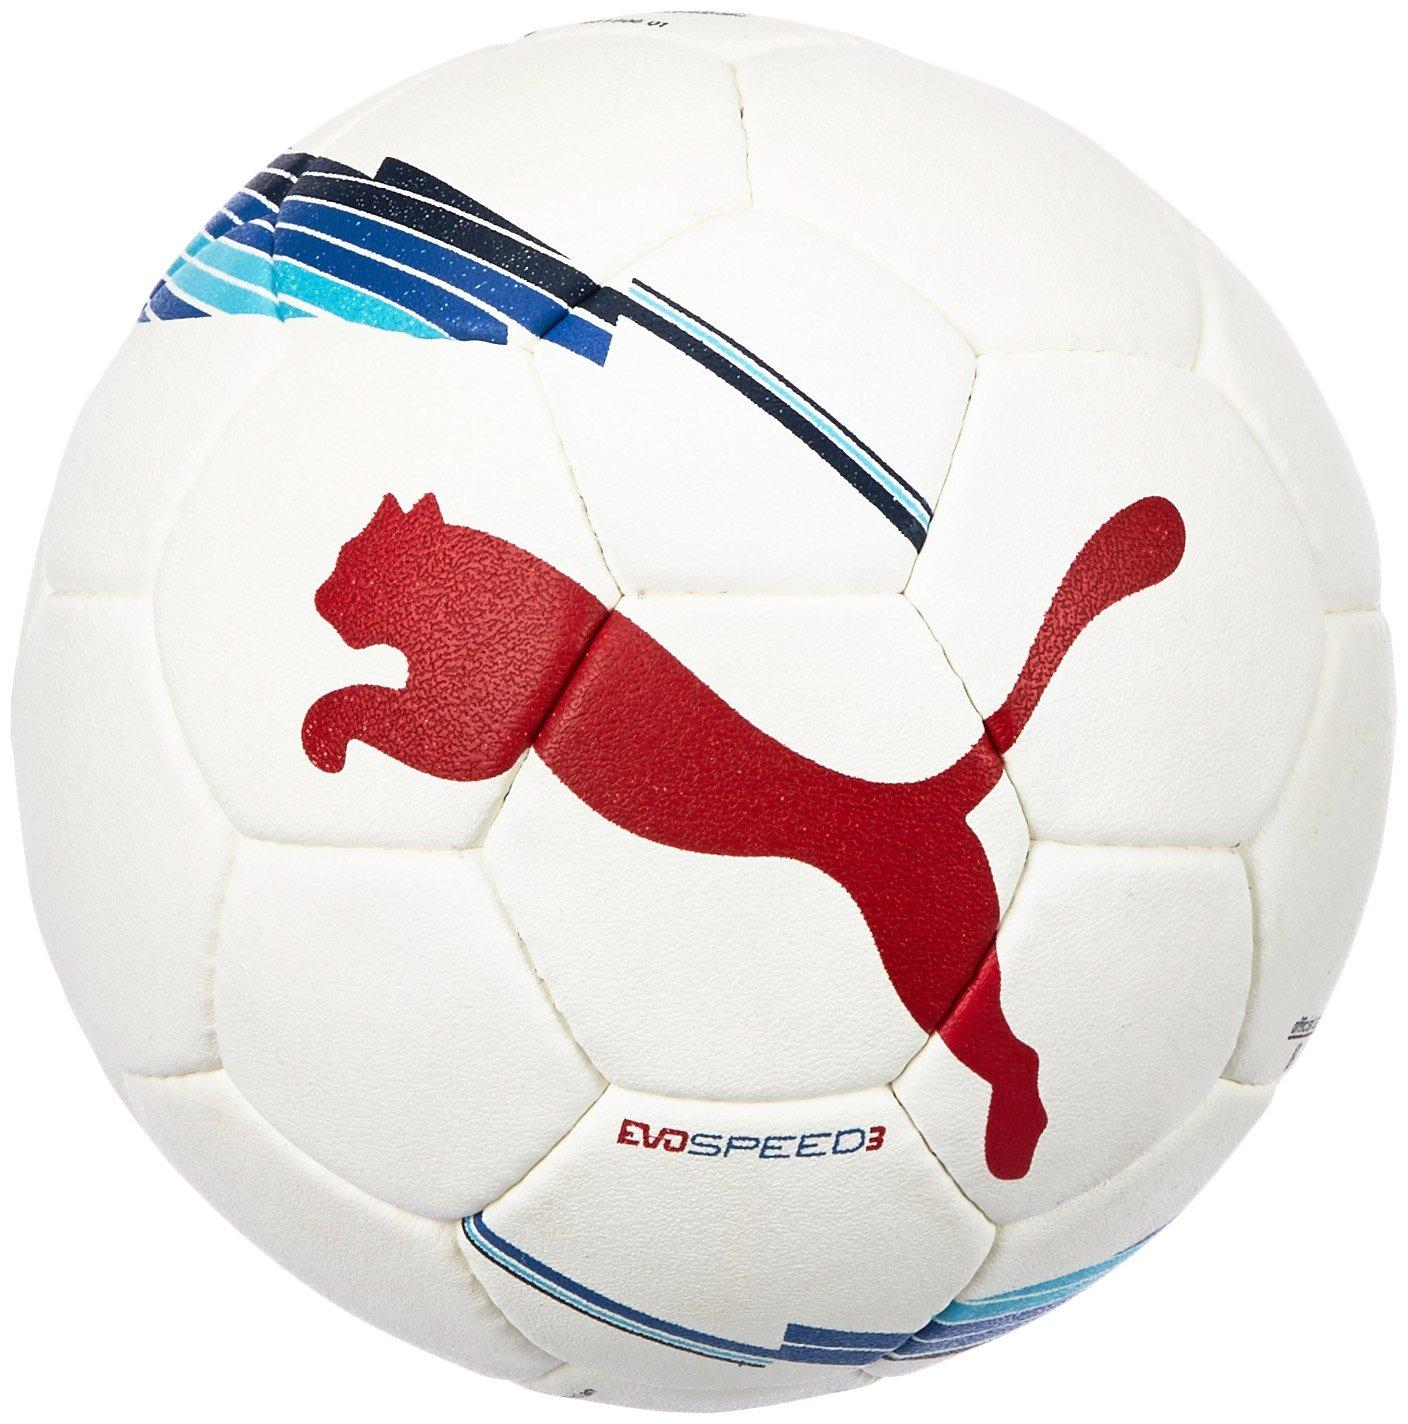 PUMA Handball Evospeed 3 HB - Pelota de Balonmano, Color Blanco ...